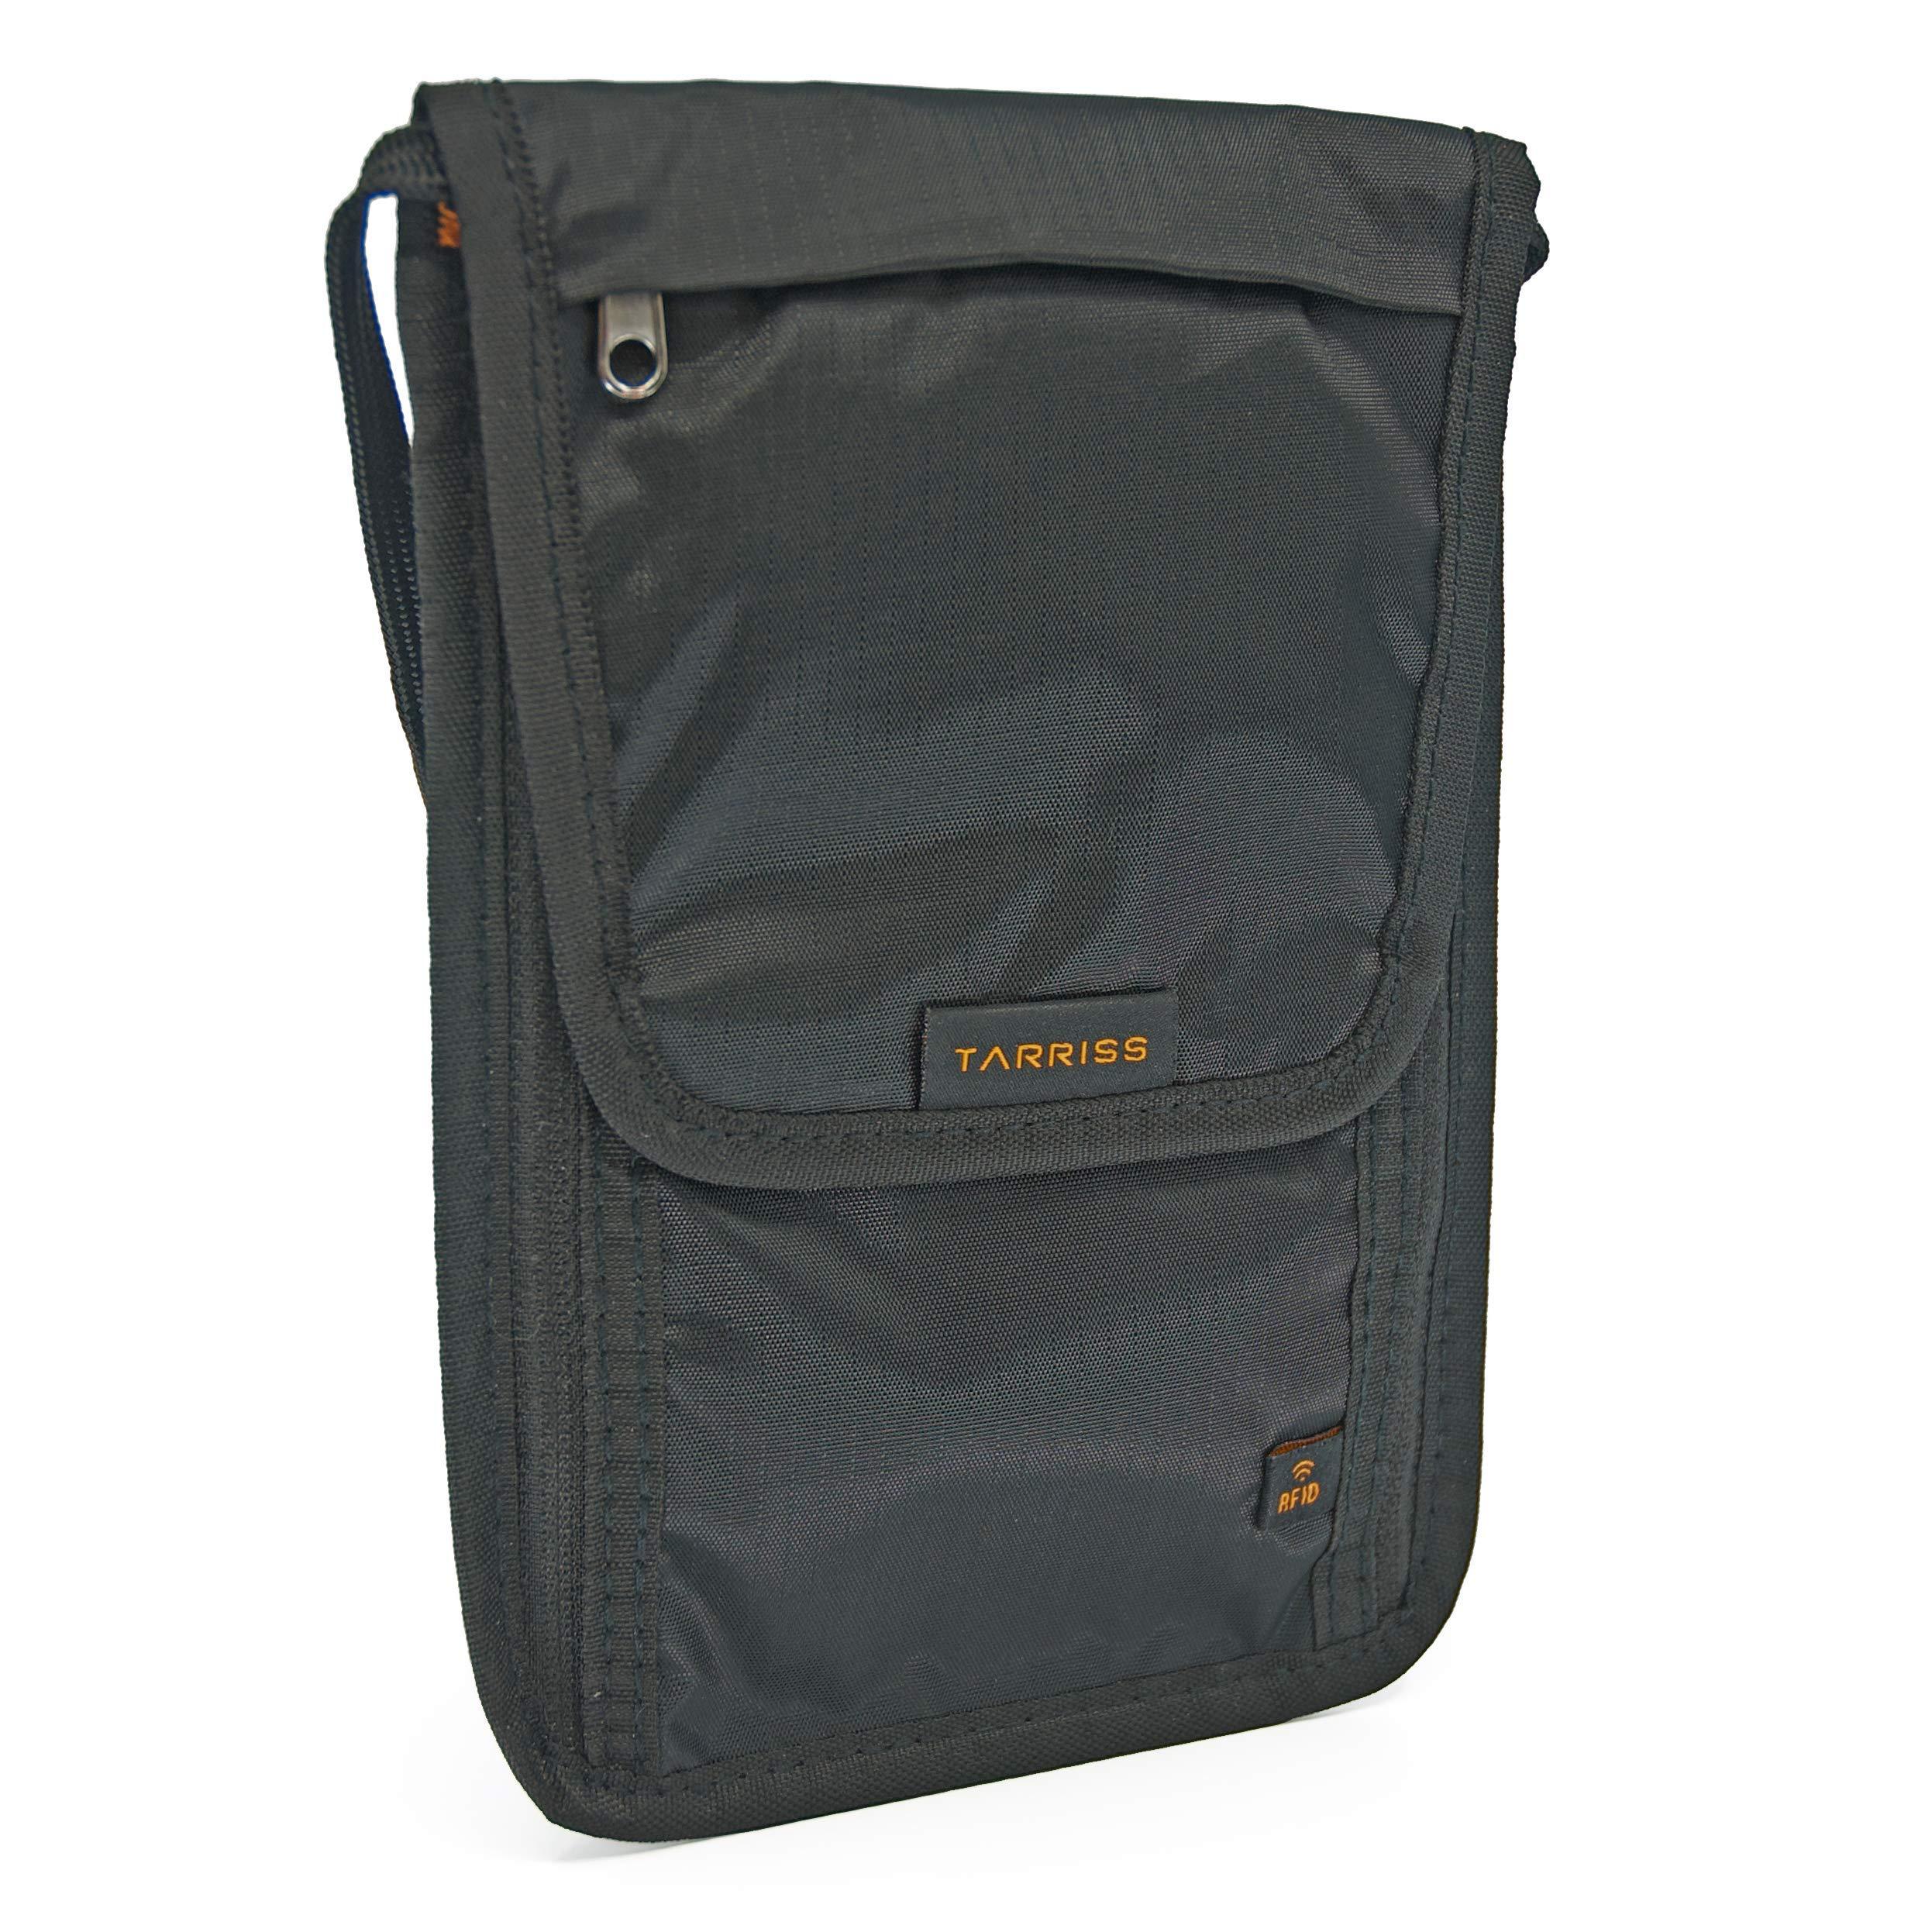 Tarriss Travel Gear RFID Passport Holder & Neck Wallet/Neck Stash product  image